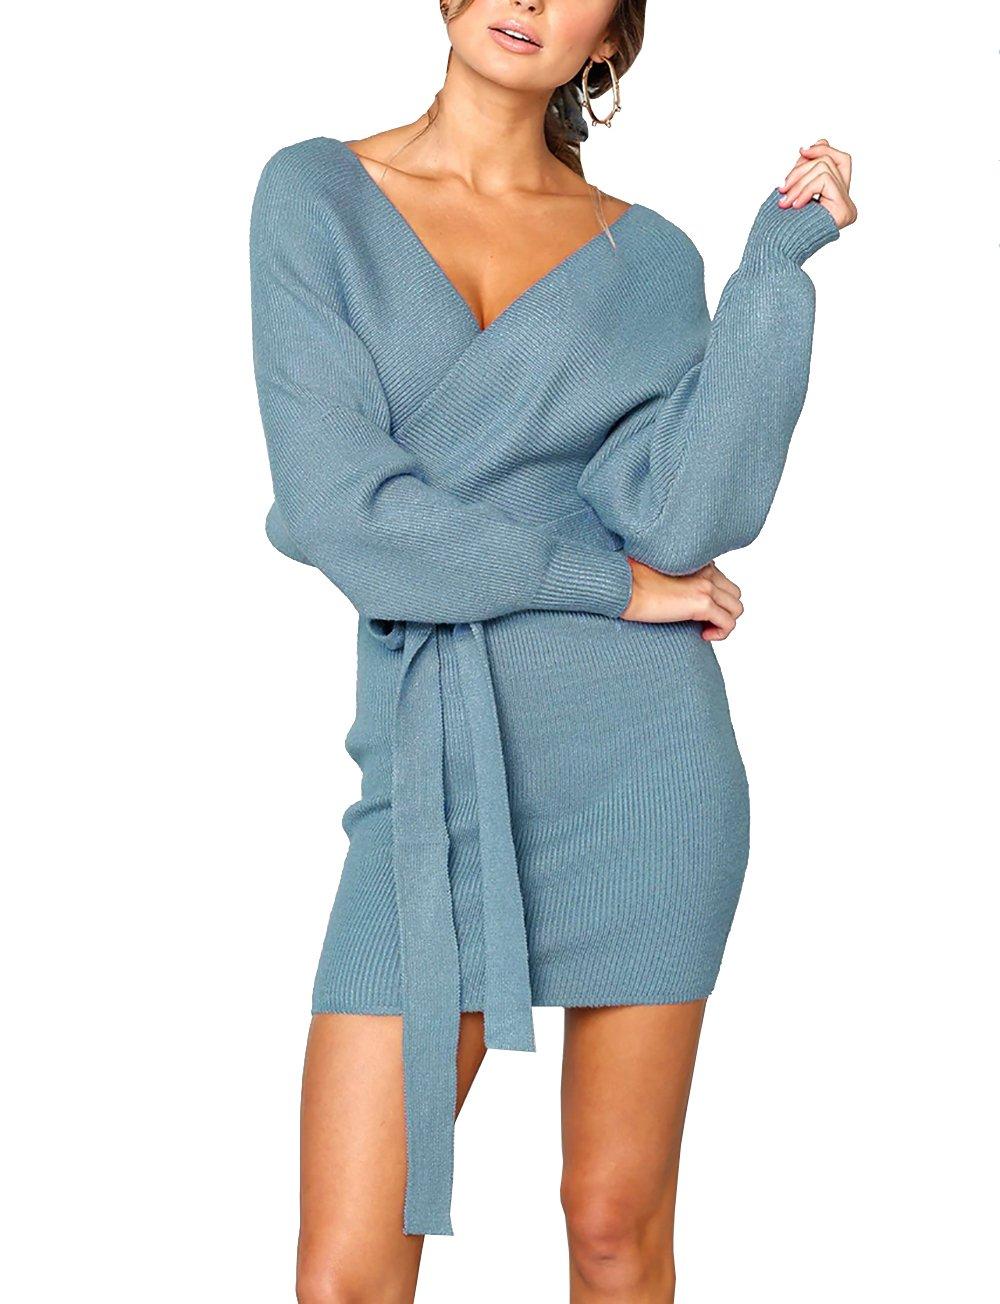 PRETTYGARDEN Women's Sexy Deep V Neck Batwing Long Sleeve Wrap Backless Elegant Bodycon Pencil Dresses with Belt (Blue, Medium)